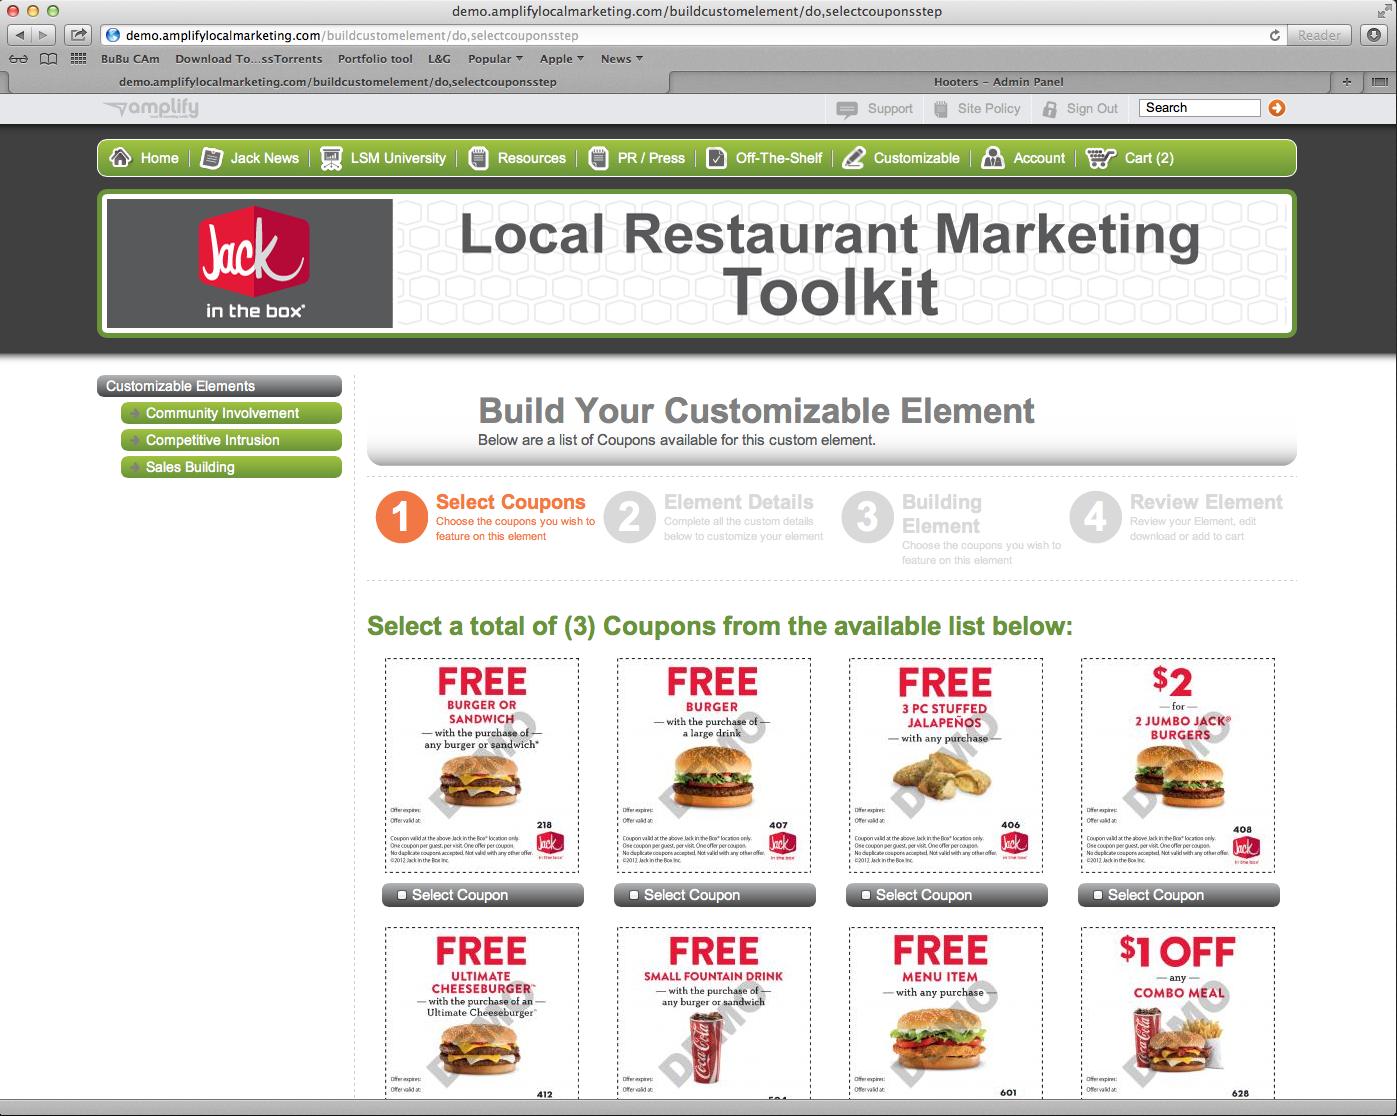 https://amplifylocalmarketing.com/wp-content/uploads/2013/02/Screen-Shot-2013-02-12-at-4.49.27-PM.png